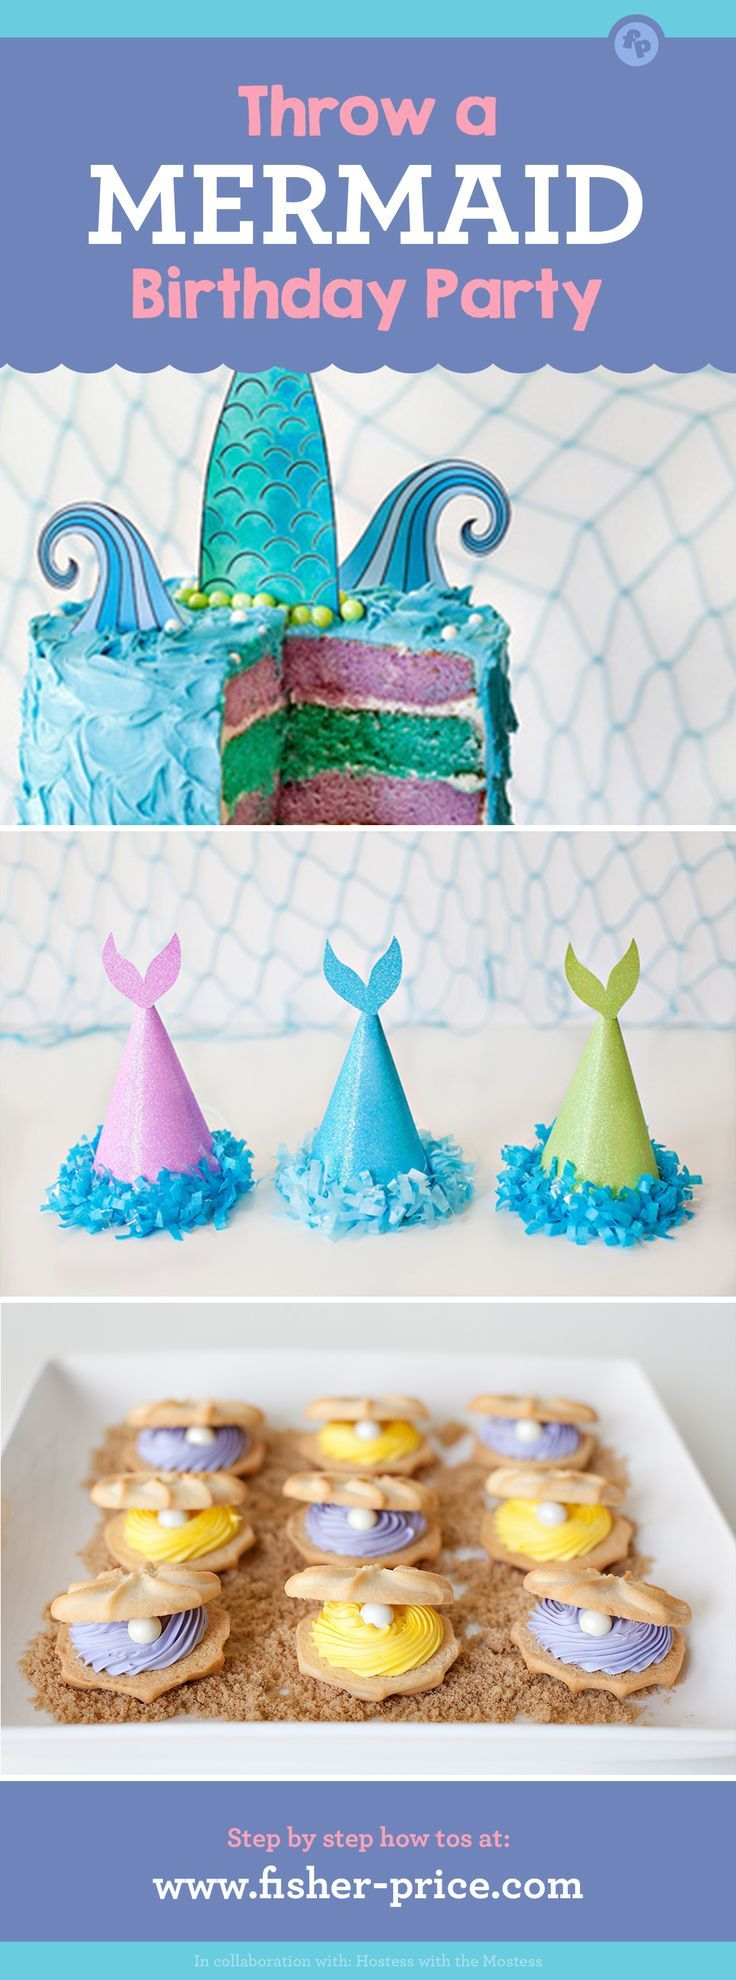 Throw a Mermaid Birthday Party